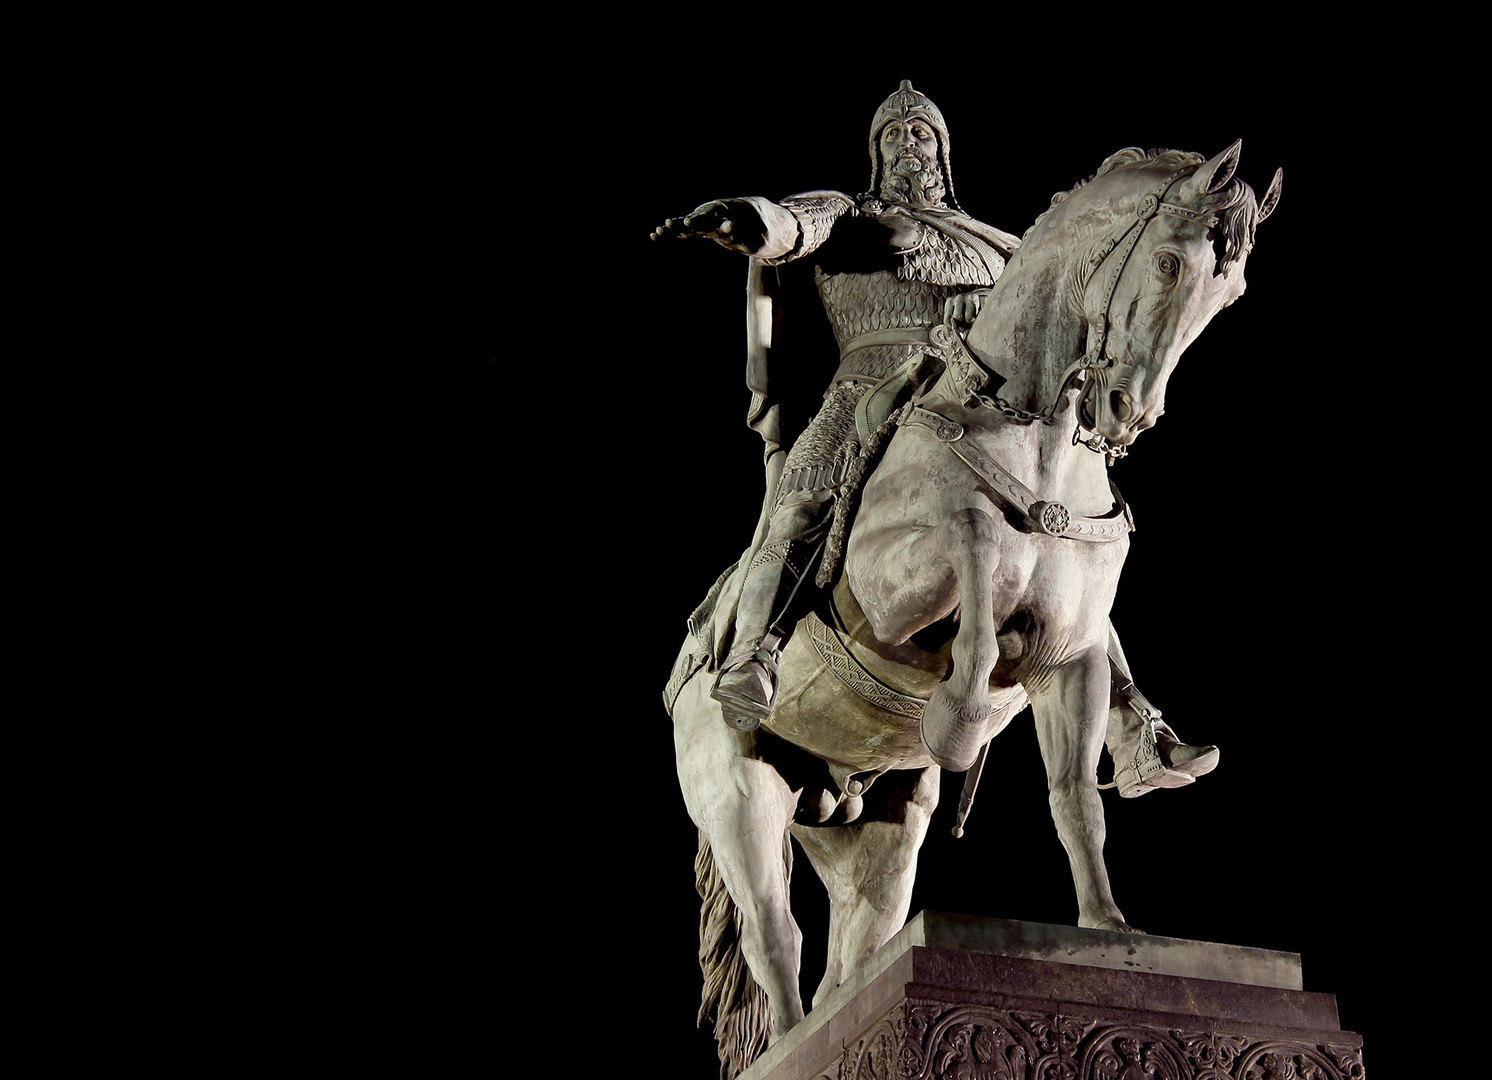 Monumento a Iúri Dolgoruki